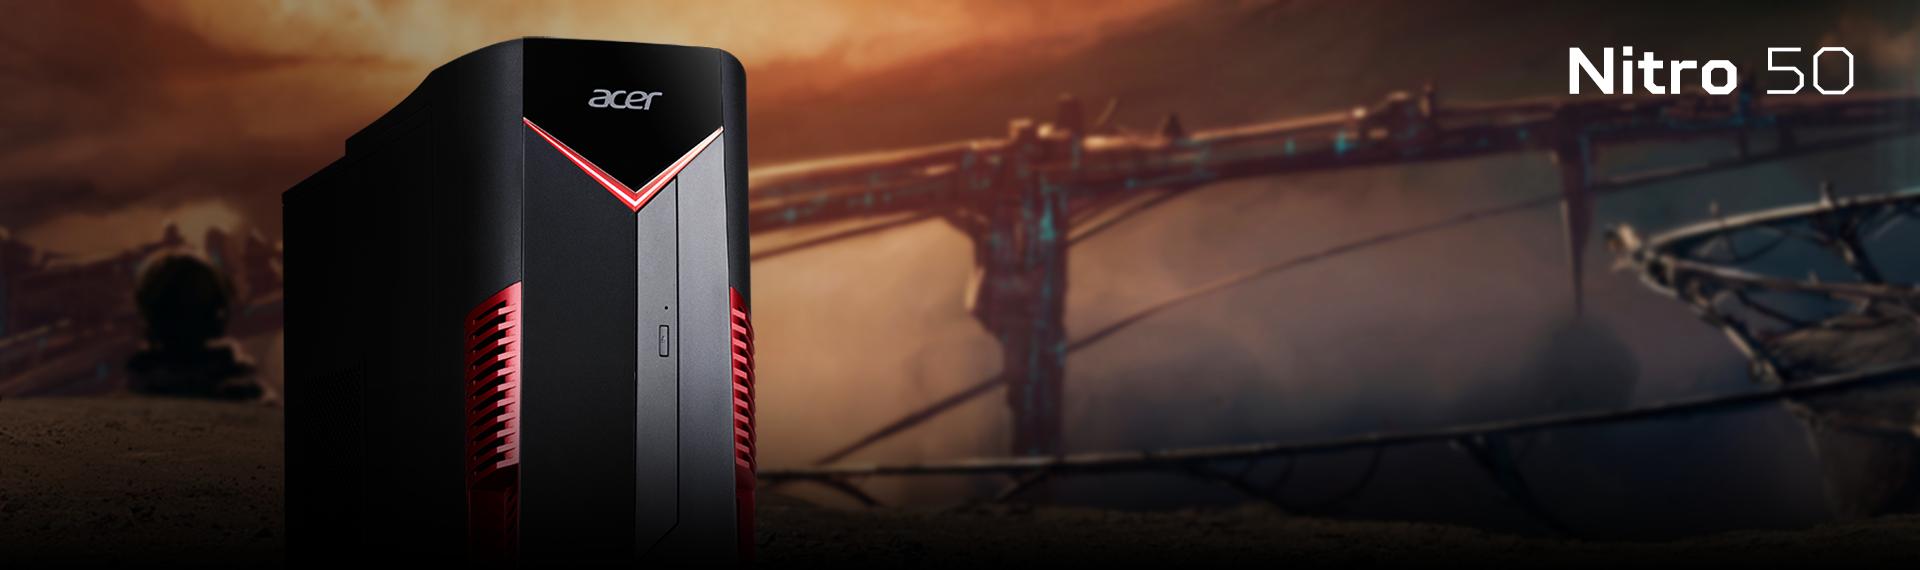 Nitro 50 Ryzen 7 Kekuatan Desktop Bikin Kamu Non-stop Mengasah Skill Gaming!